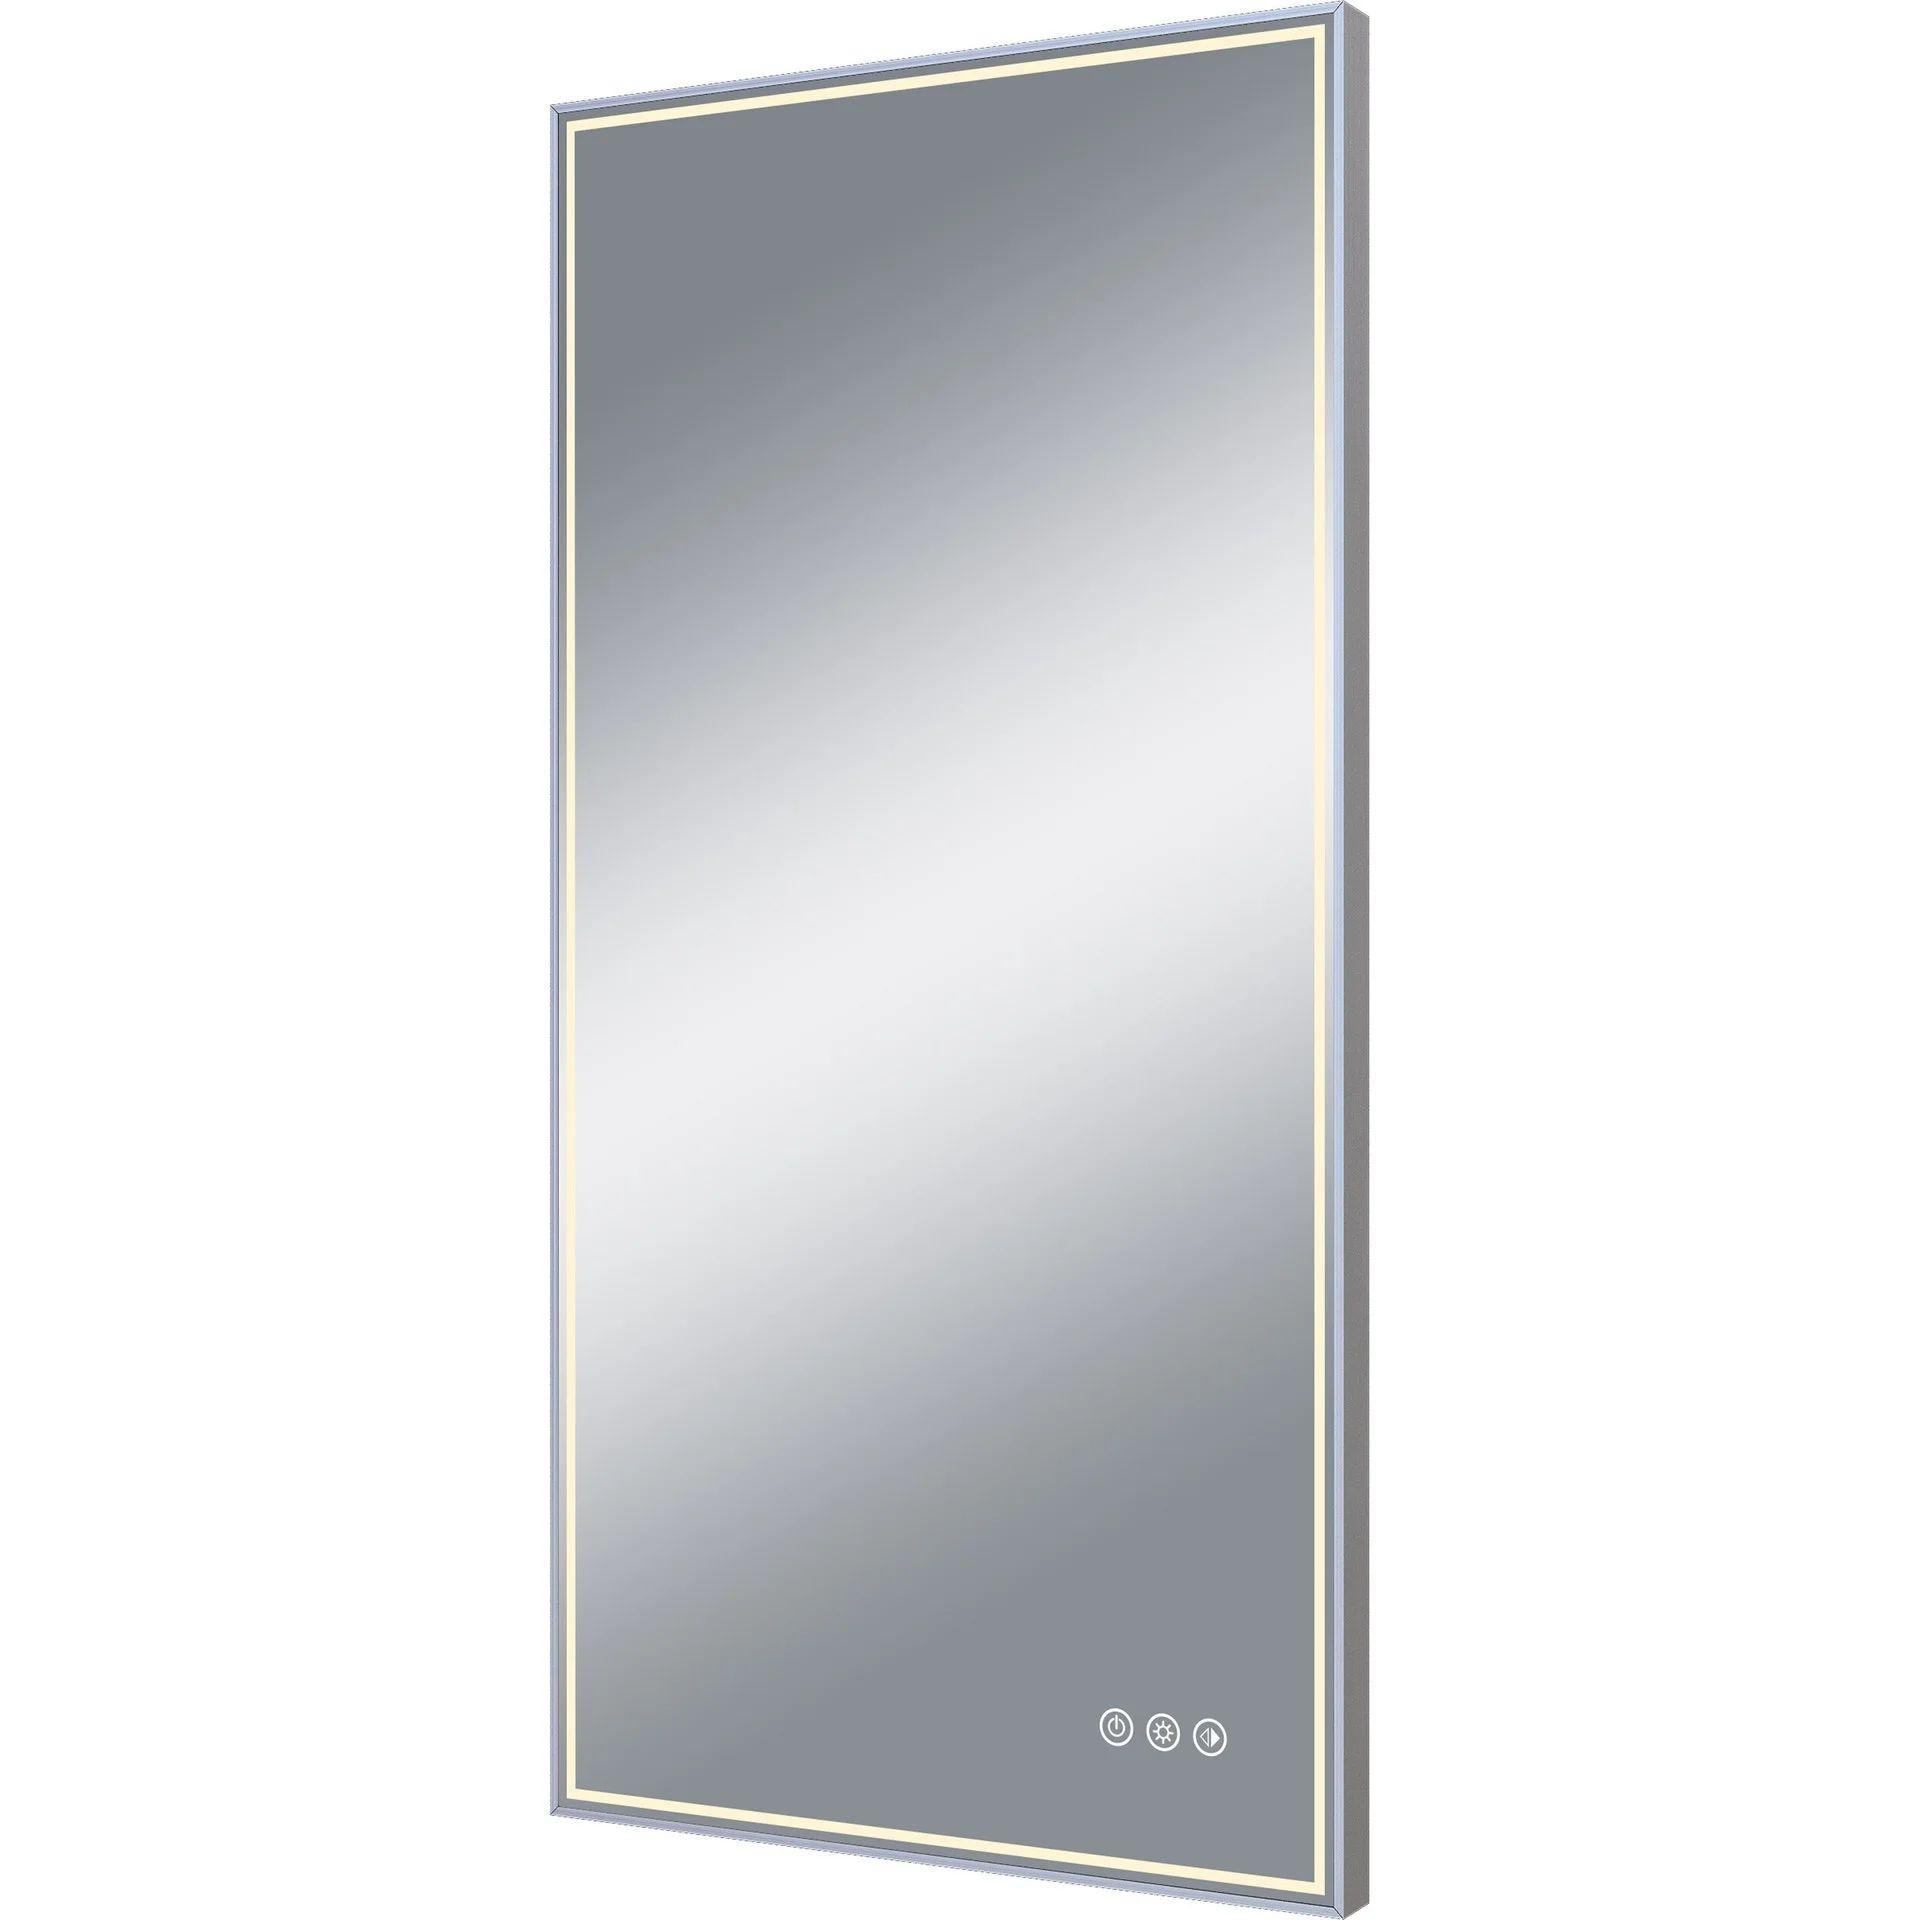 Miroir Lumineux Avec Eclairage Integre L 45 X H 90 Cm Neo Leroy Merlin